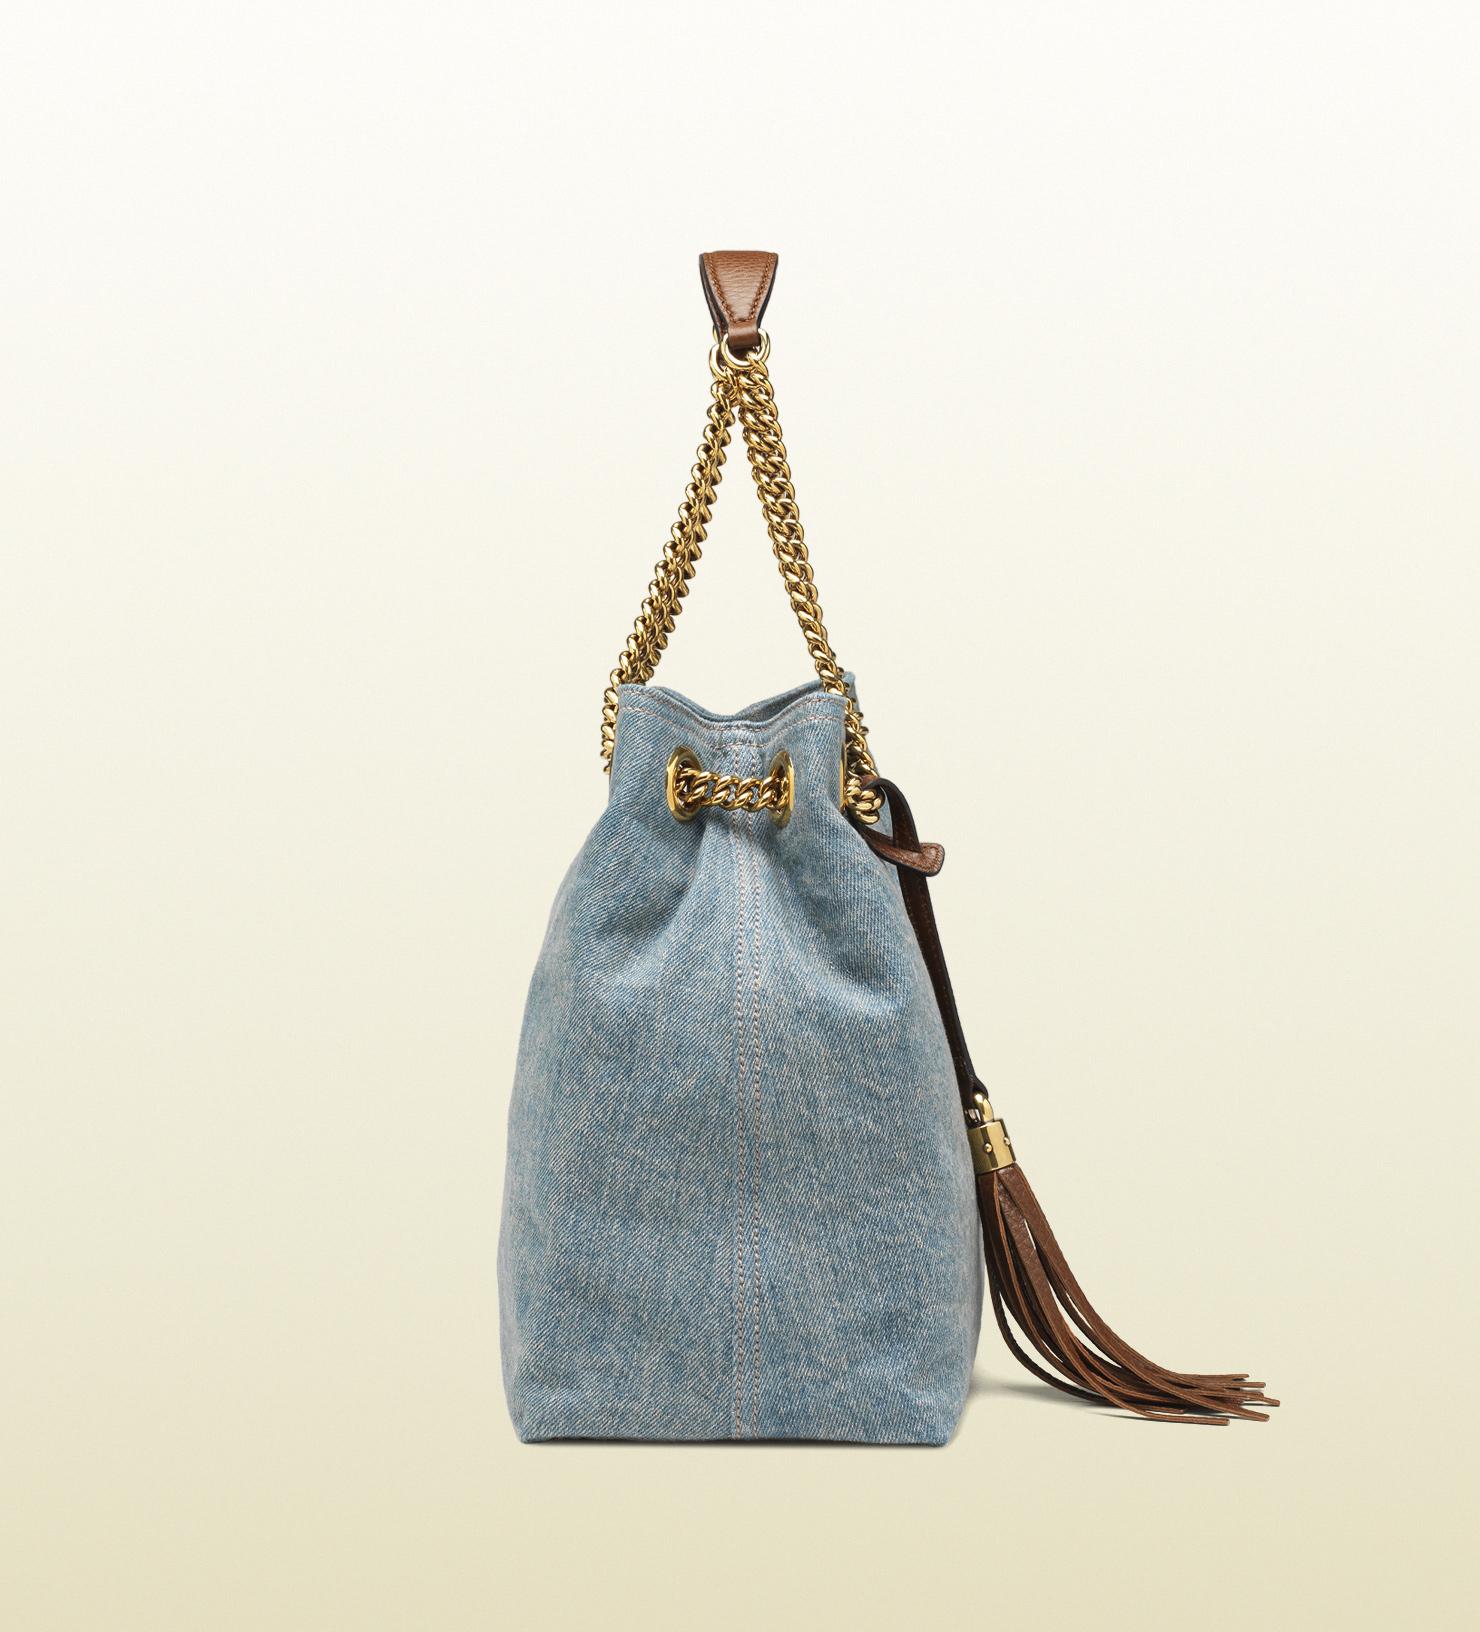 976571abe Gucci Soho Denim Shoulder Bag in Blue - Lyst